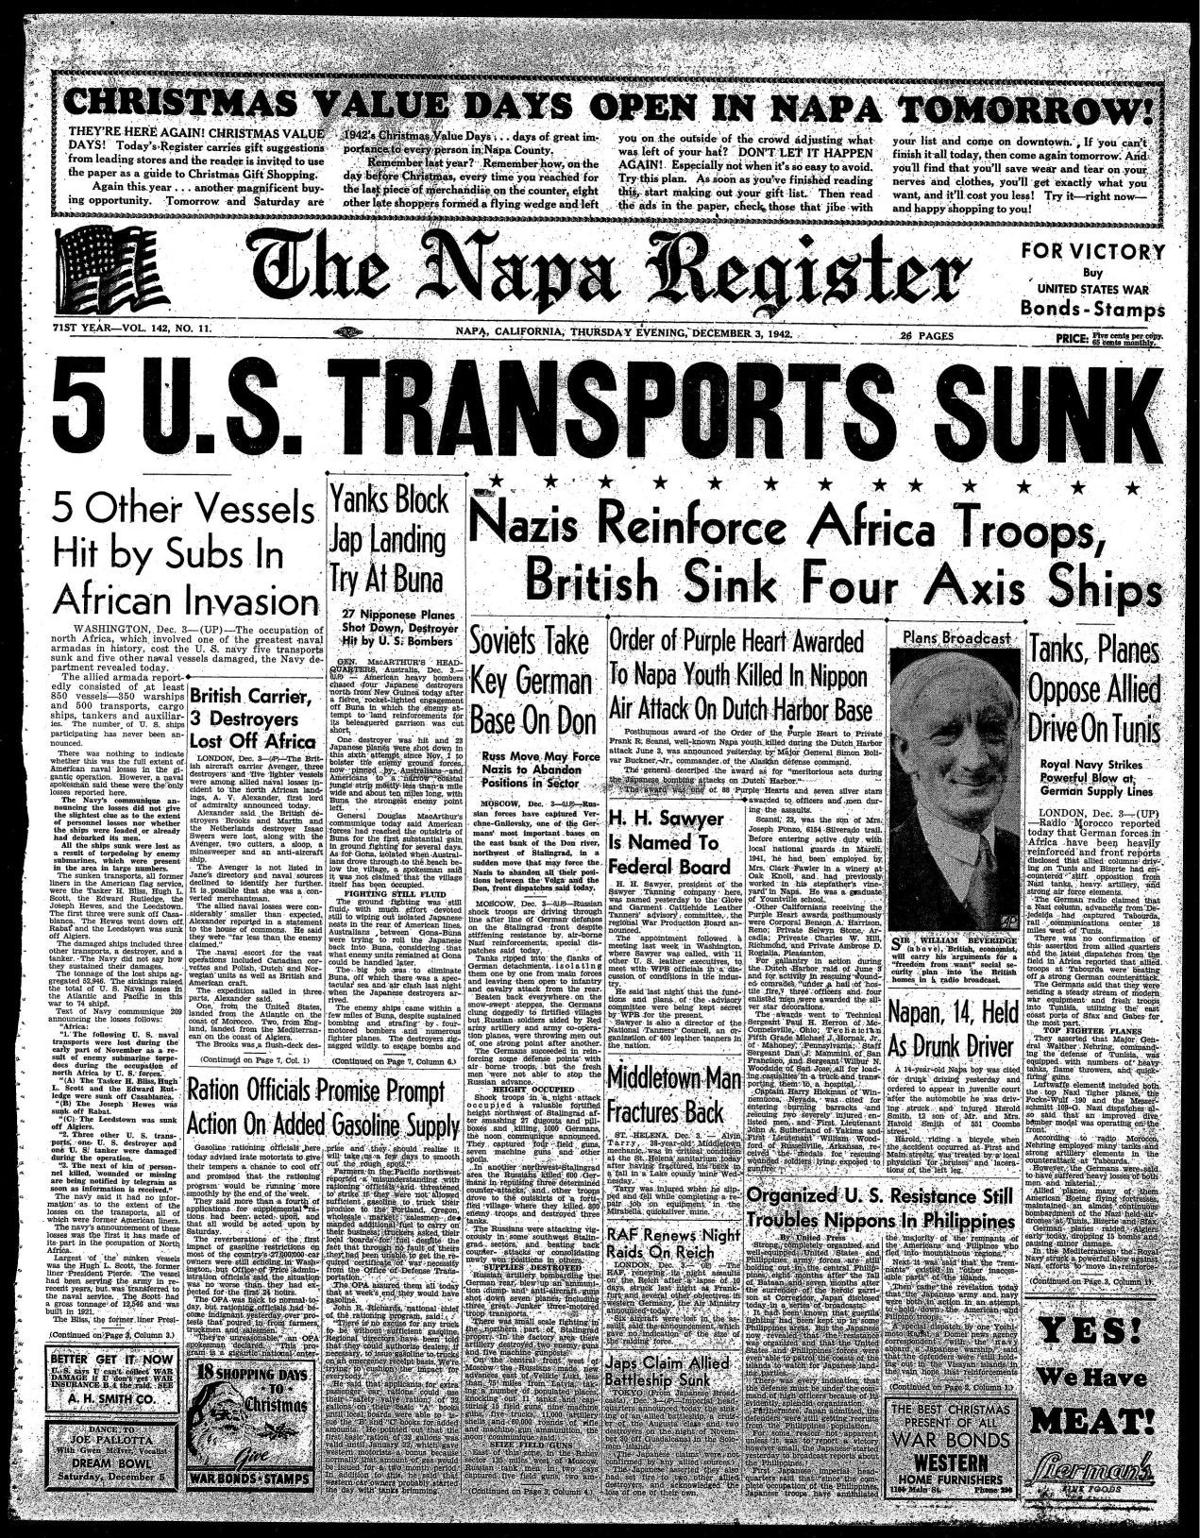 Dec. 3, 1942